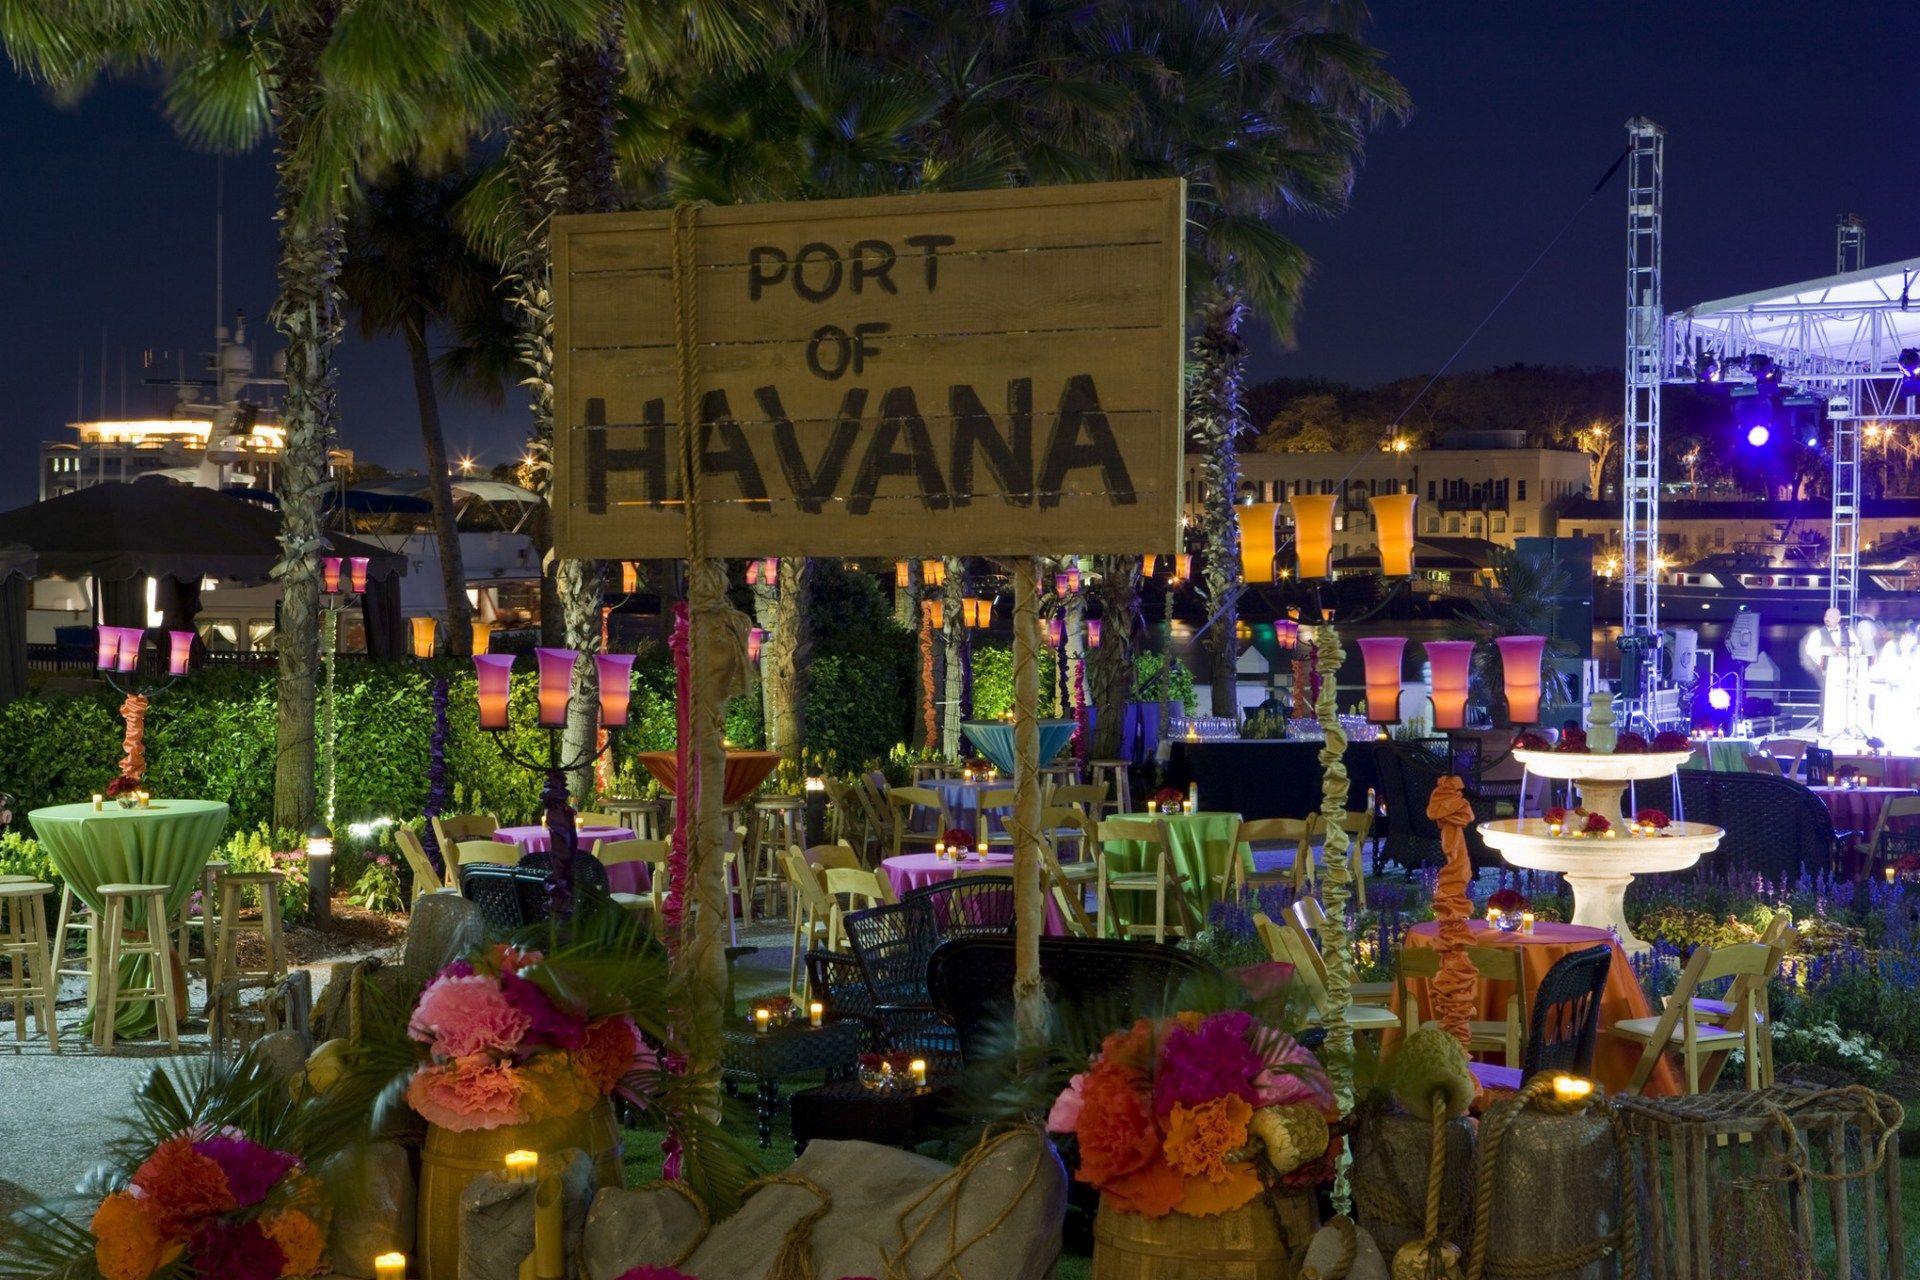 Havana nights party decor ideas 54 - YS Edu Sky & Havana nights party decor ideas 54 | Pinterest | Havana nights party ...